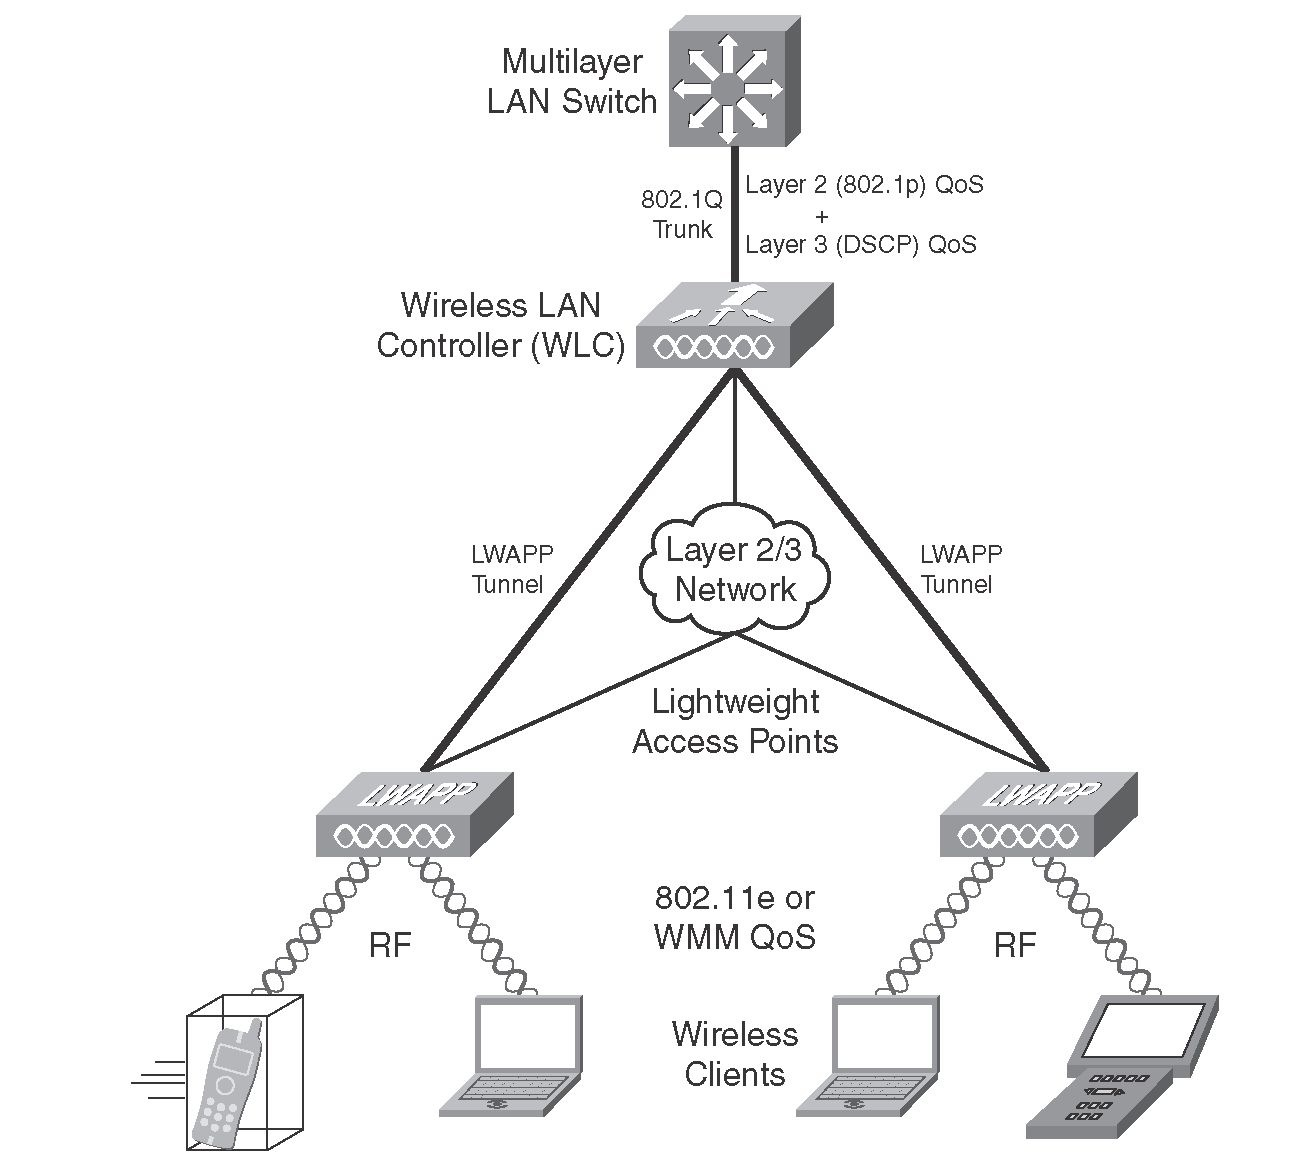 LWAPP Tunnel in the Split-MAC Architecture